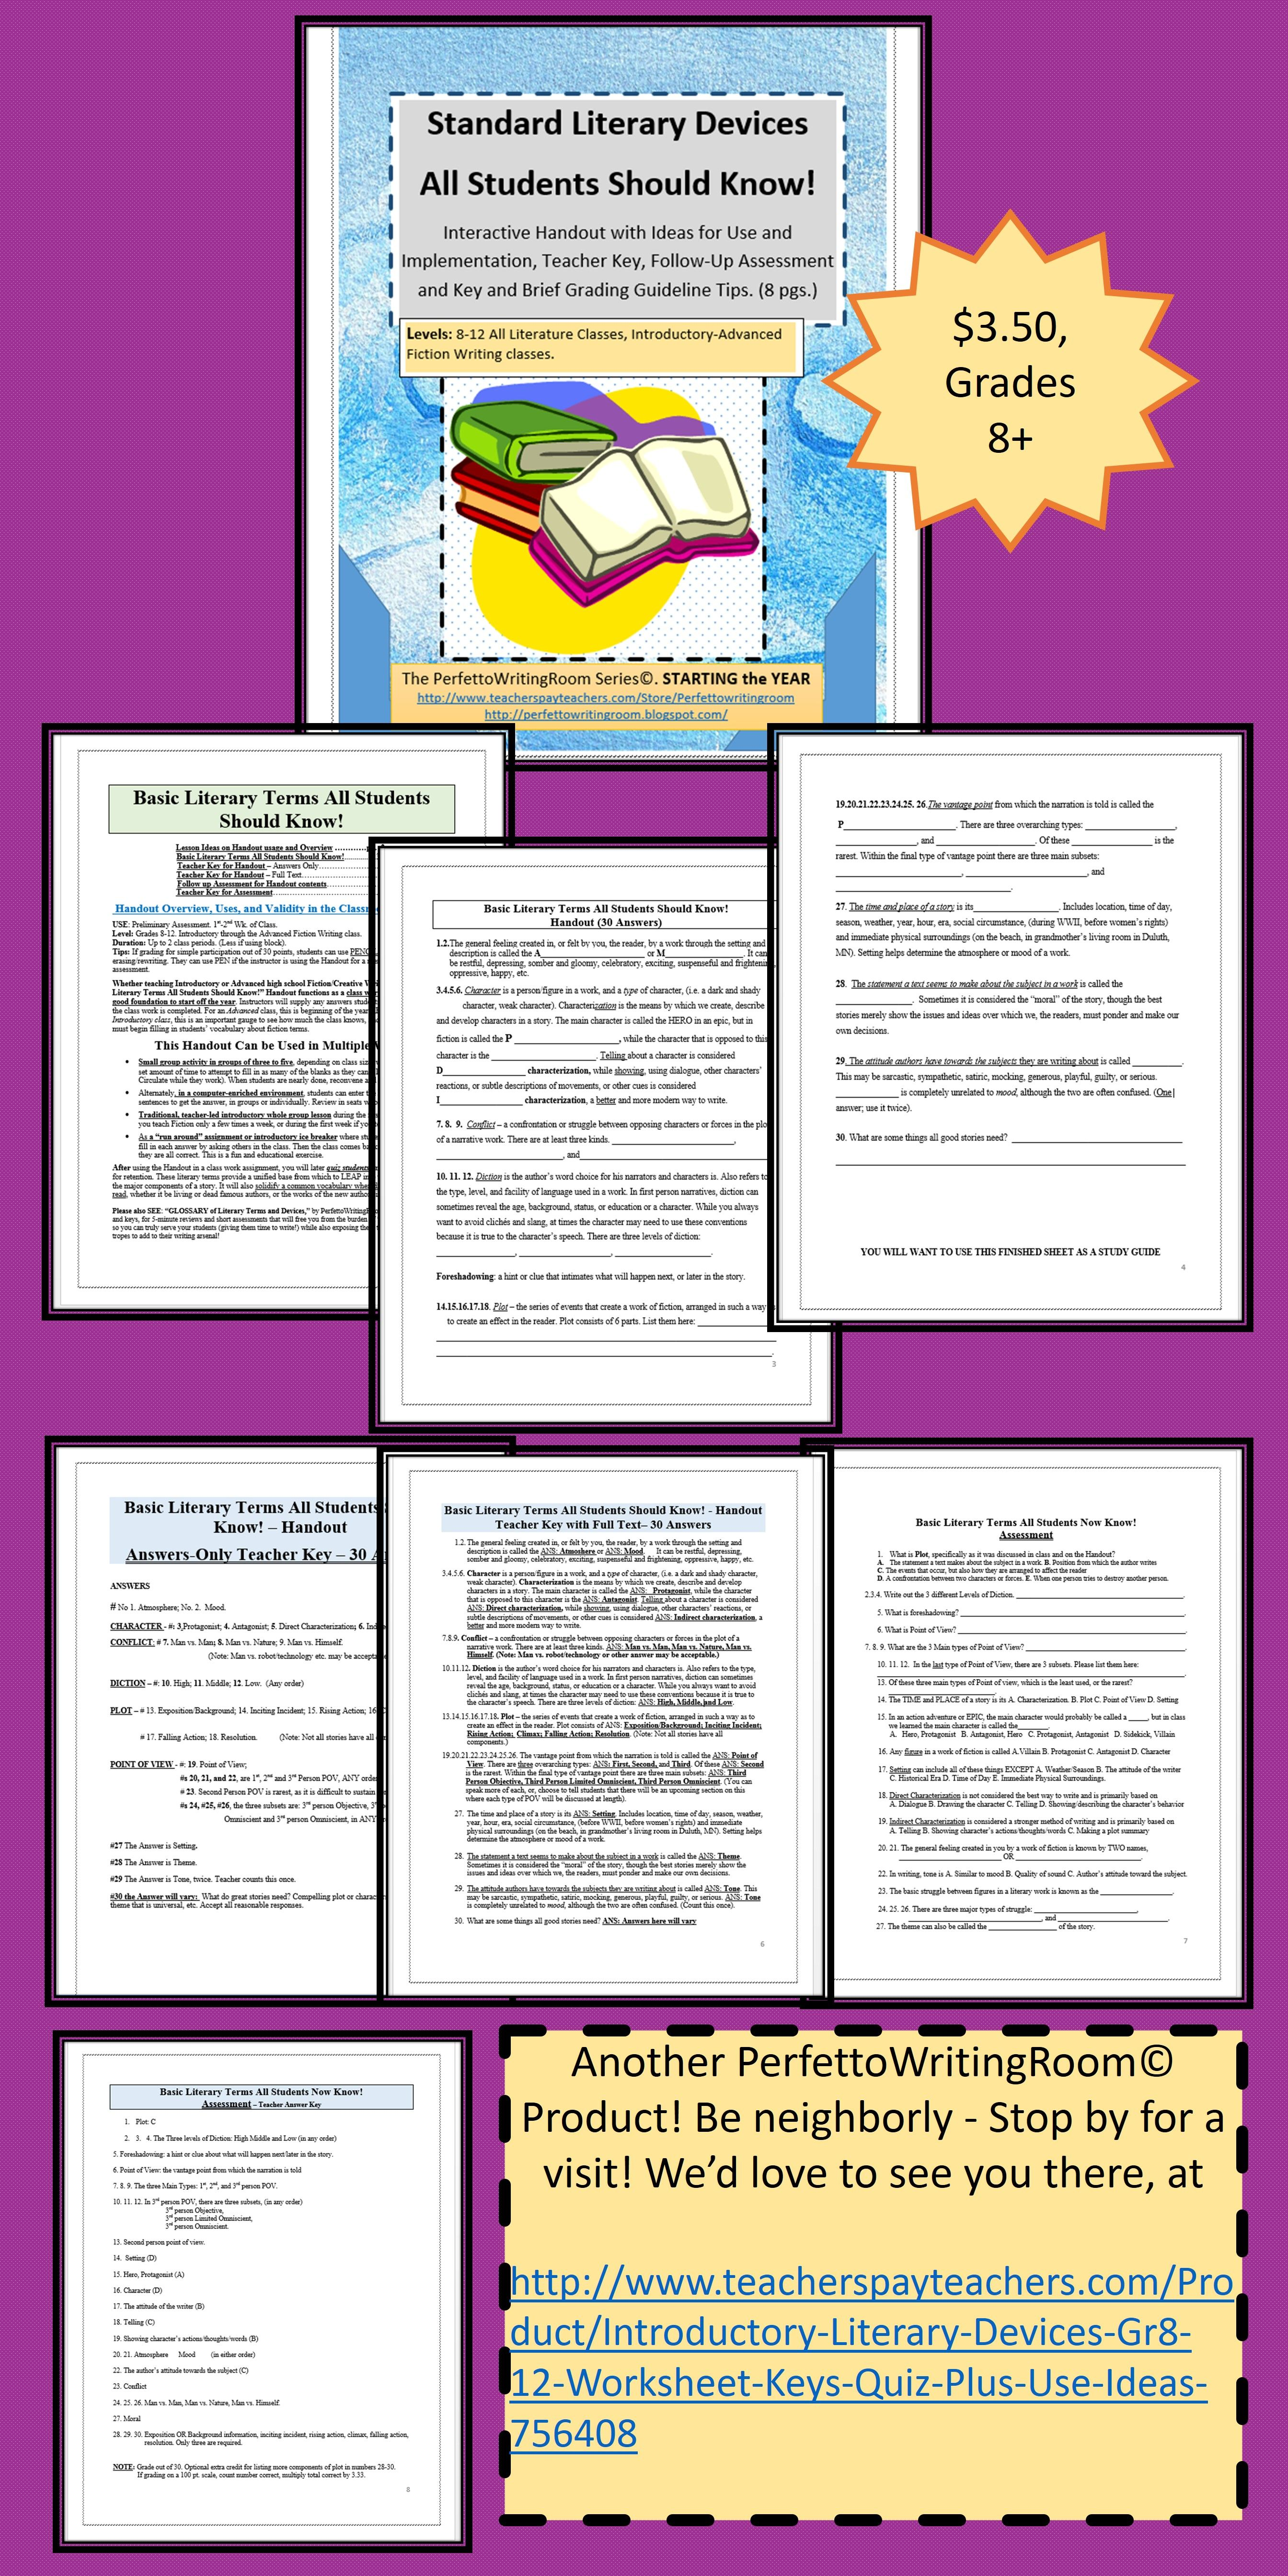 medium resolution of Introductory Literary Devices- Gr.7-12 Worksheet; Keys